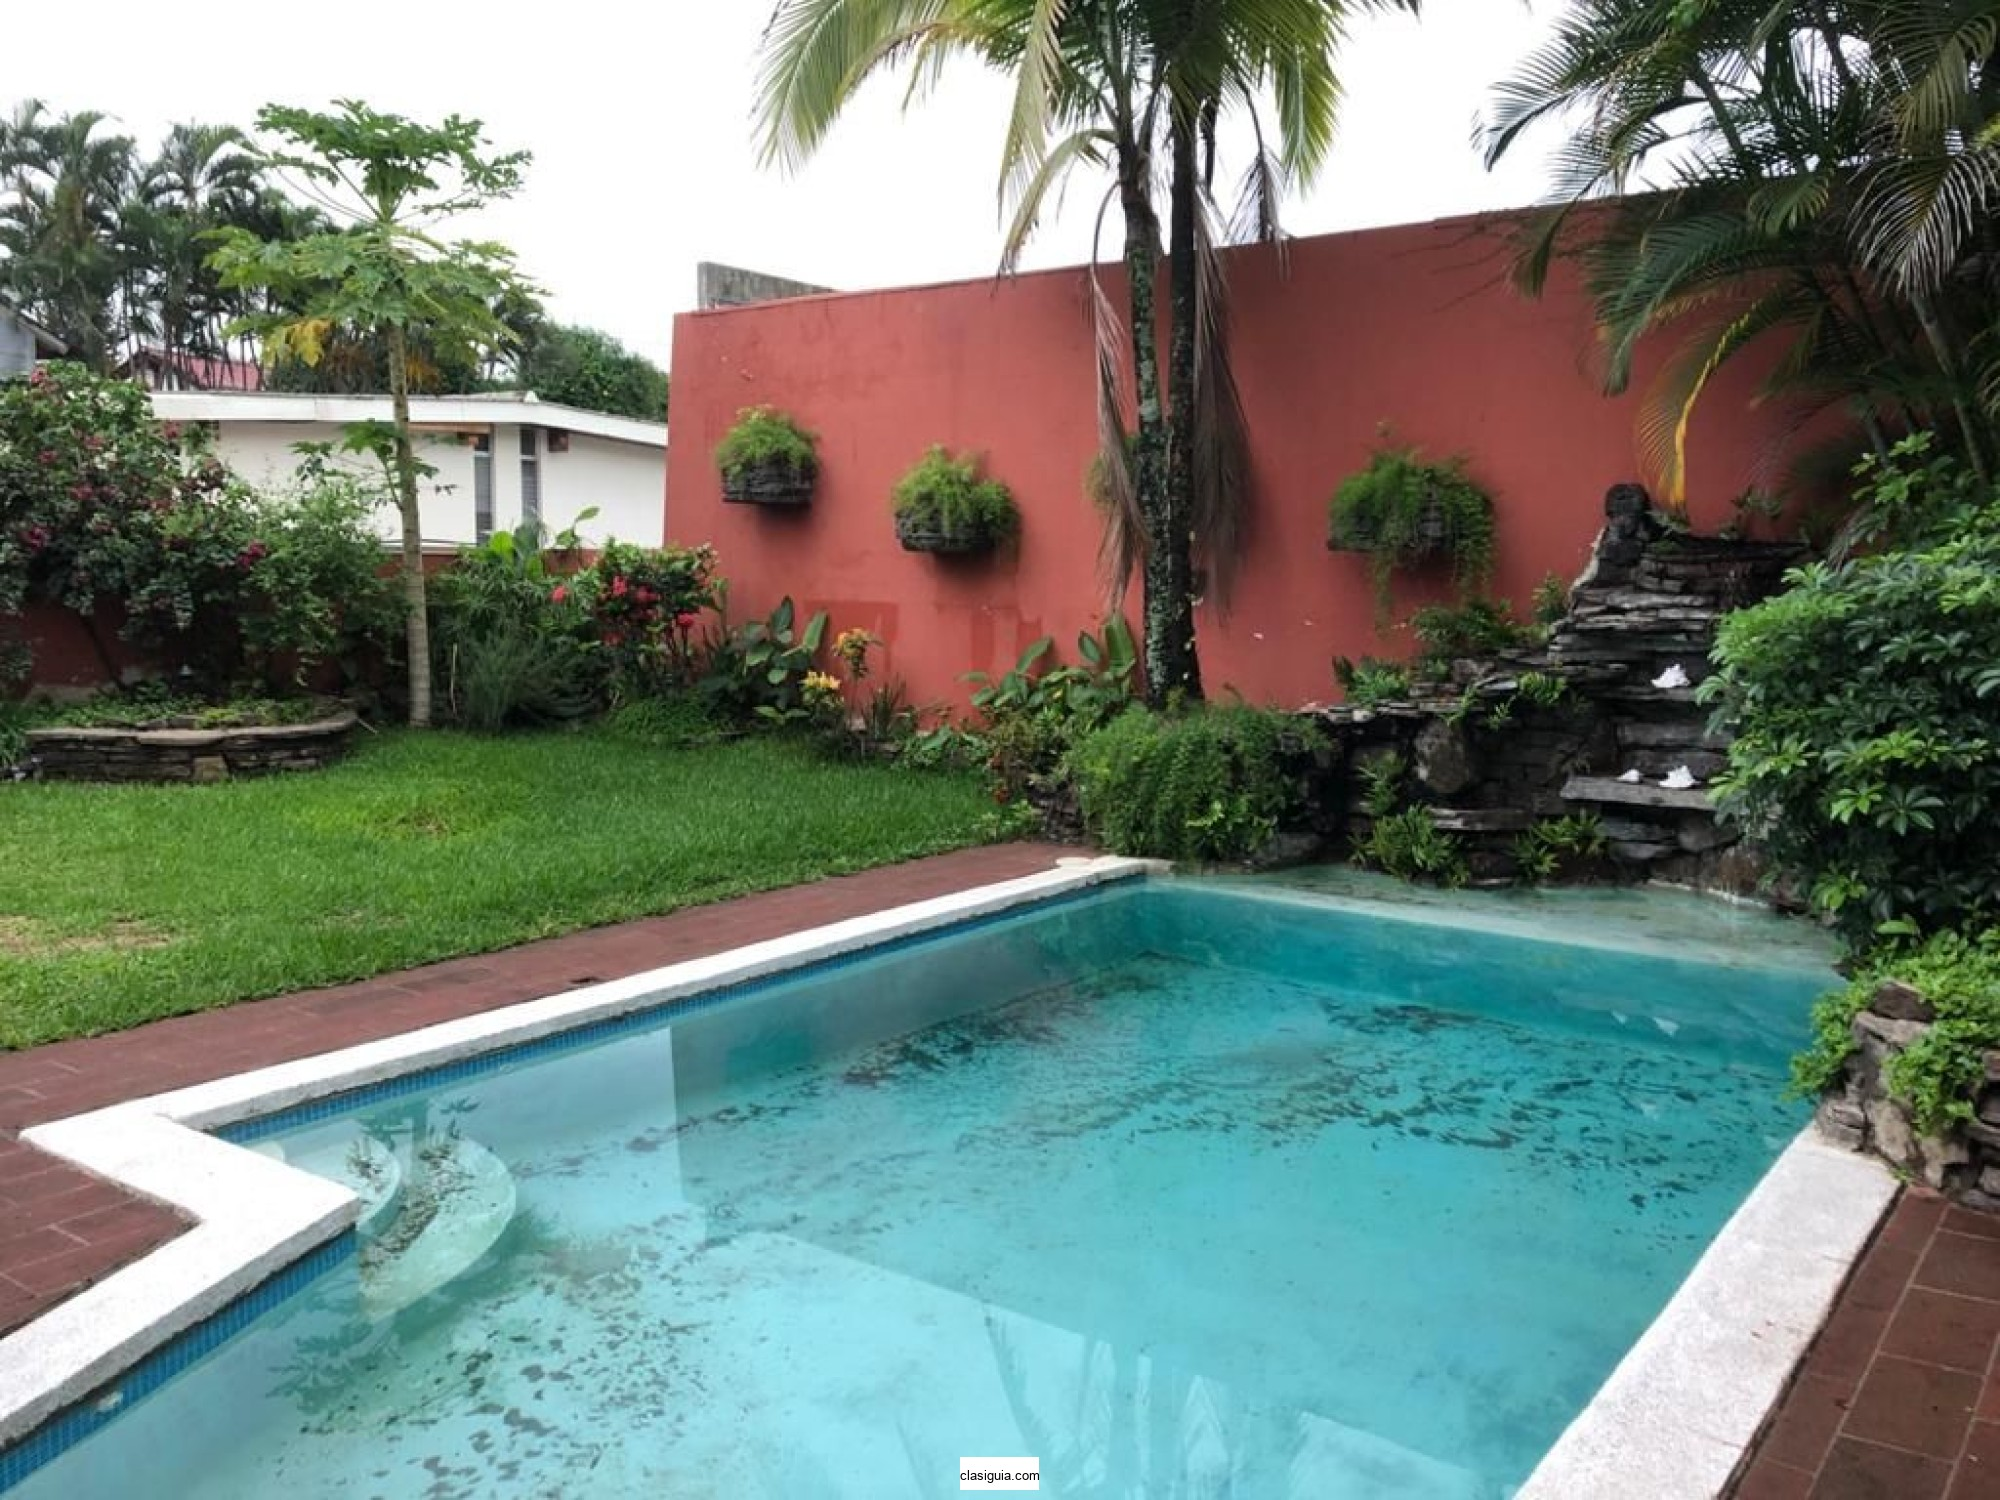 SE VENDE CASA CALLE LA MASCOTA - residencial pequeño PRIVADO ~ 500 v2 de terreno ~ 370 mts2 construcción